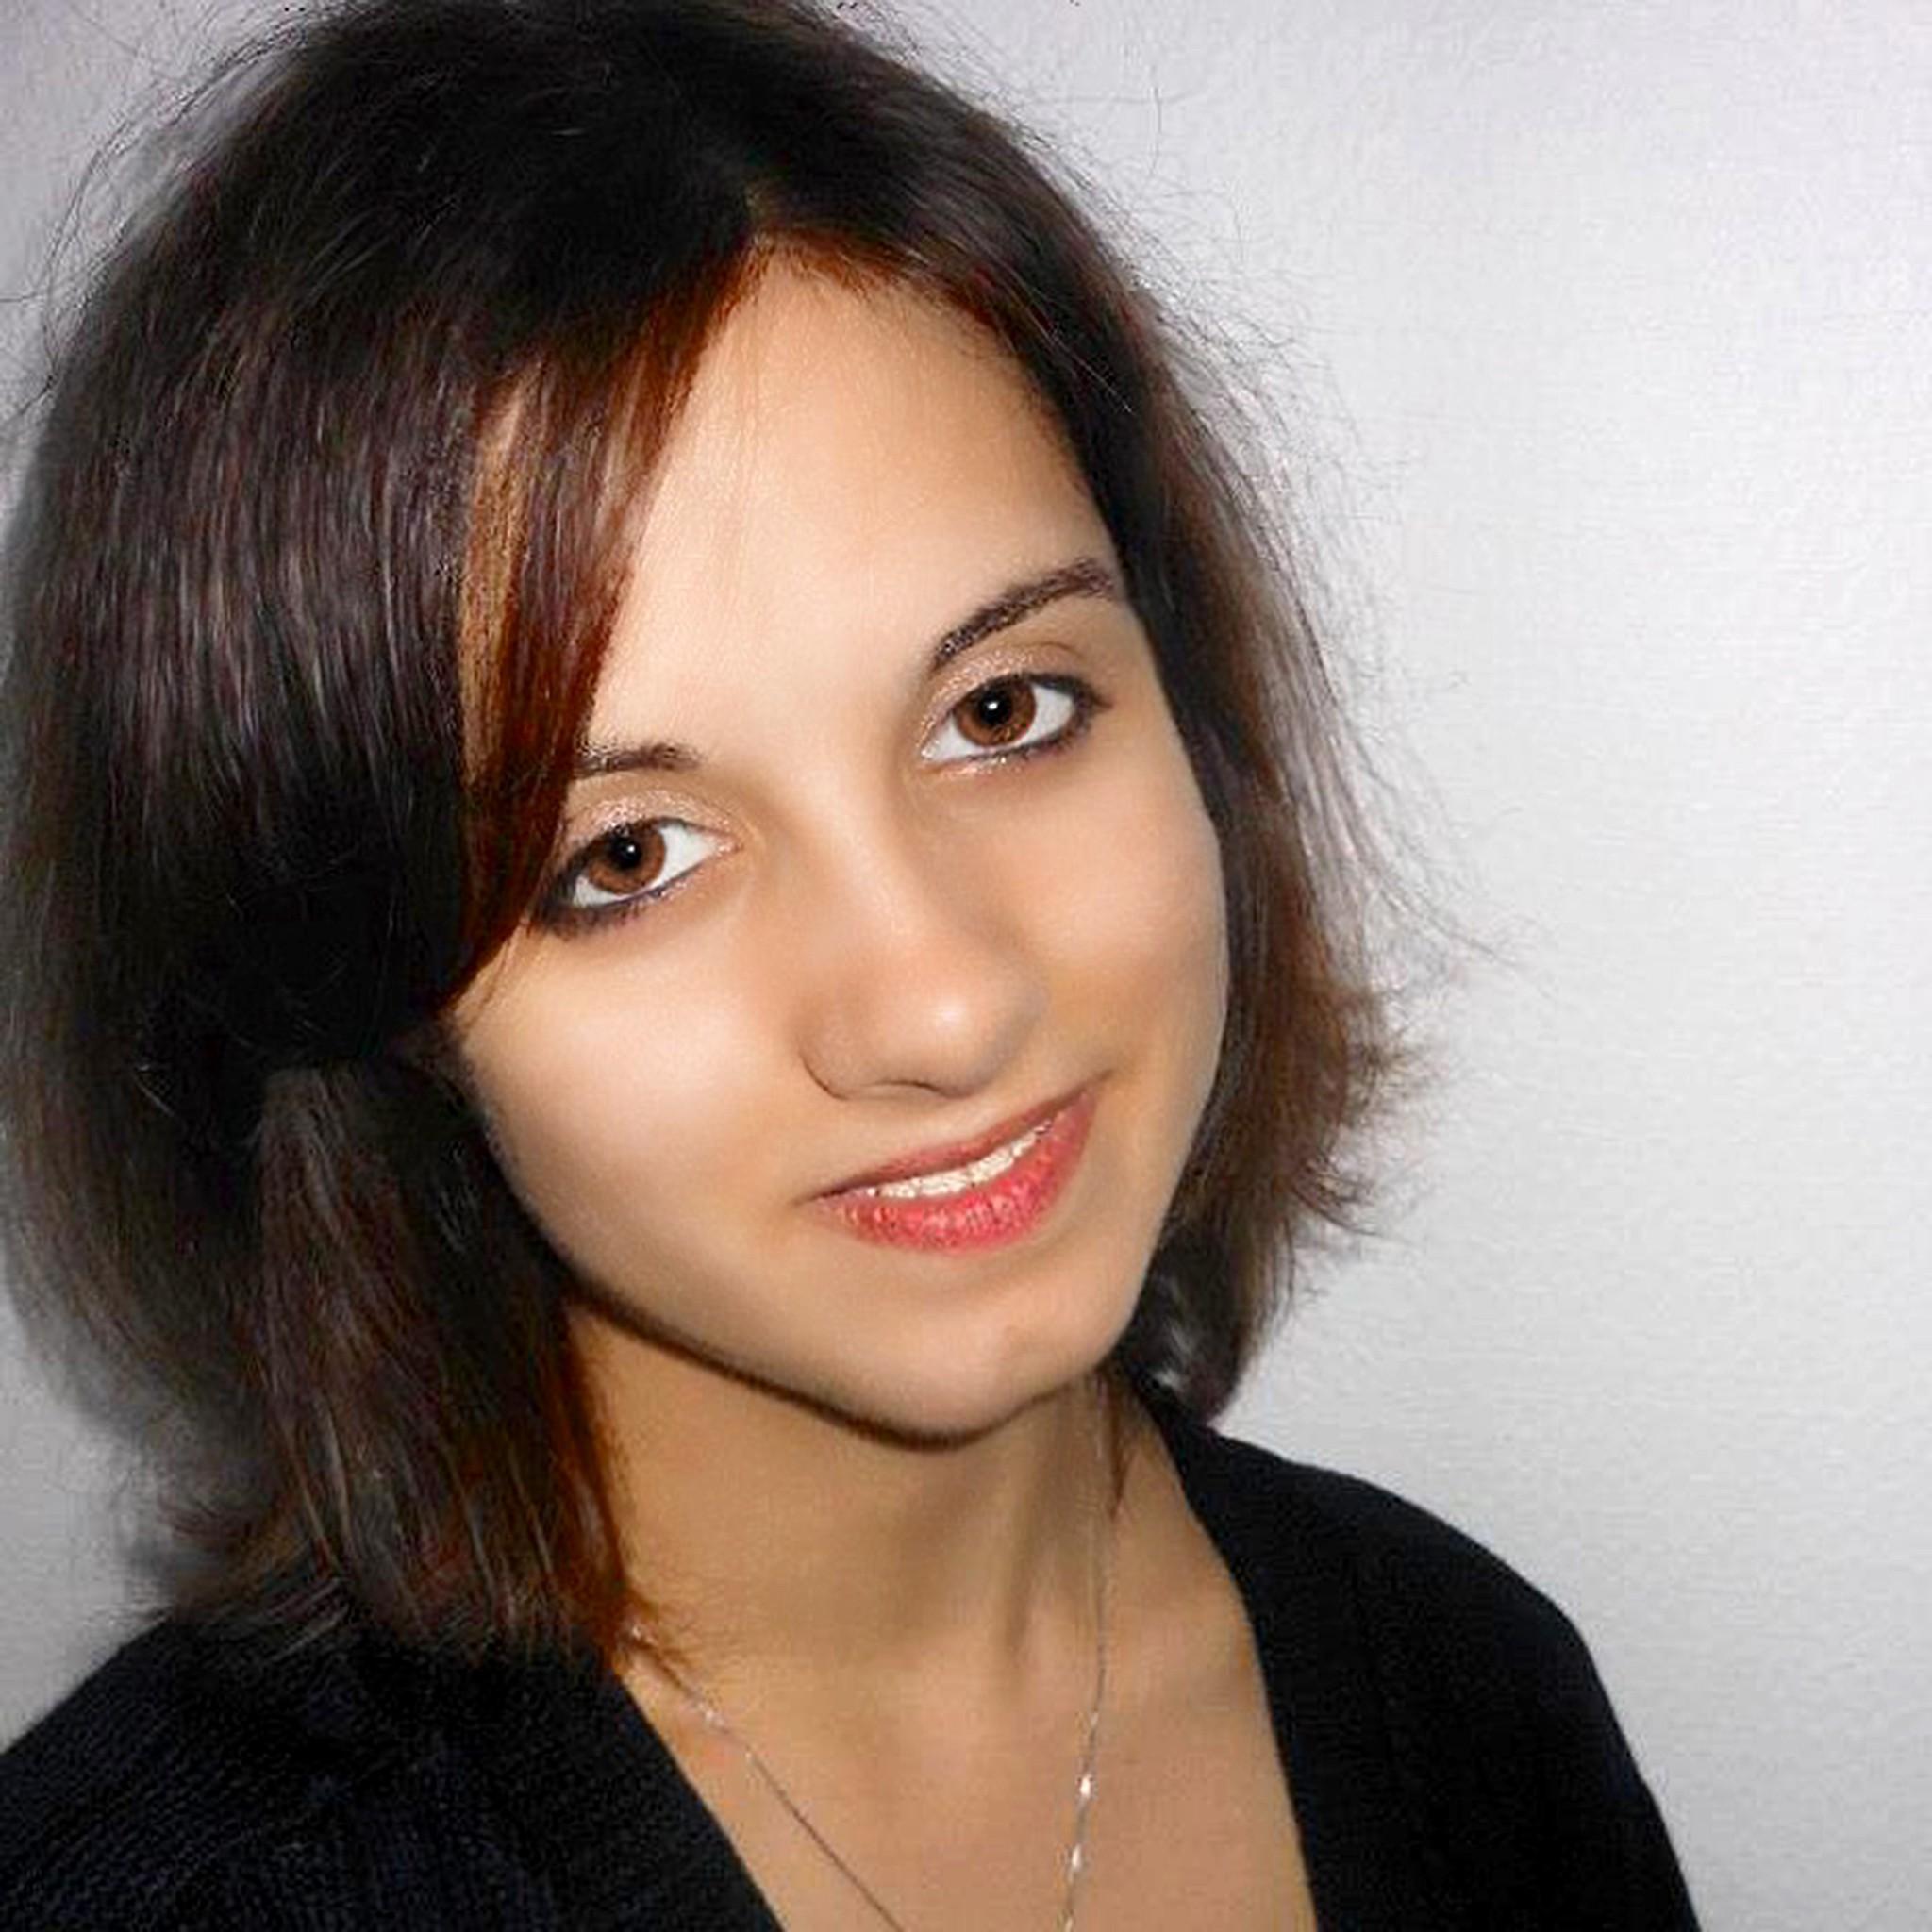 Ania Sarian